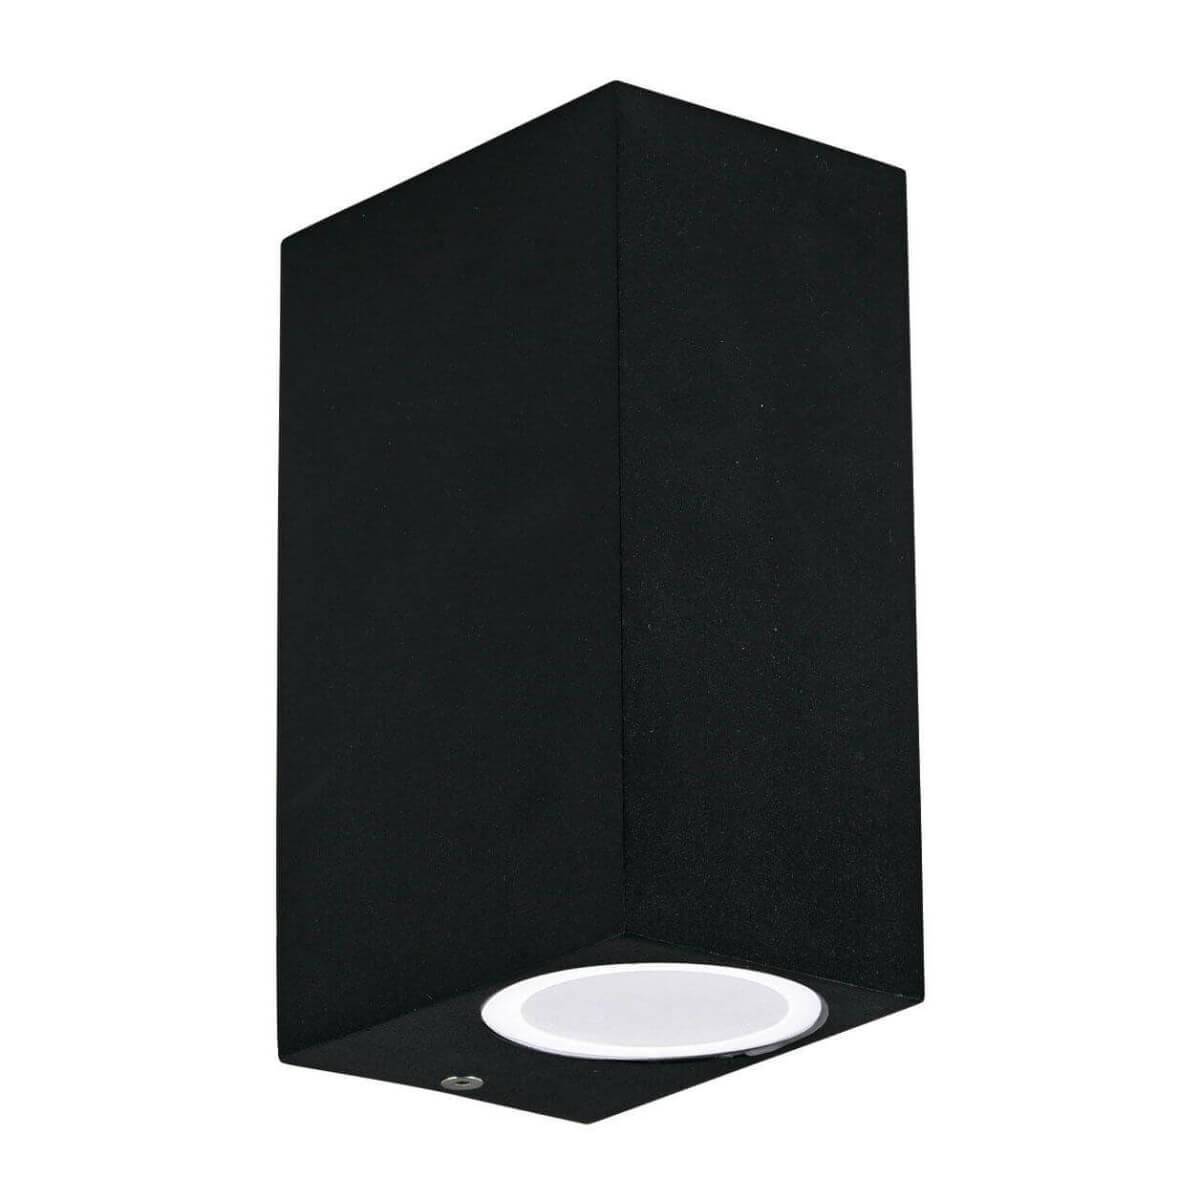 Уличный светильник Ideal Lux Up AP2 Nero, G9 люстра ideal lux opera nero opera sp6 nero